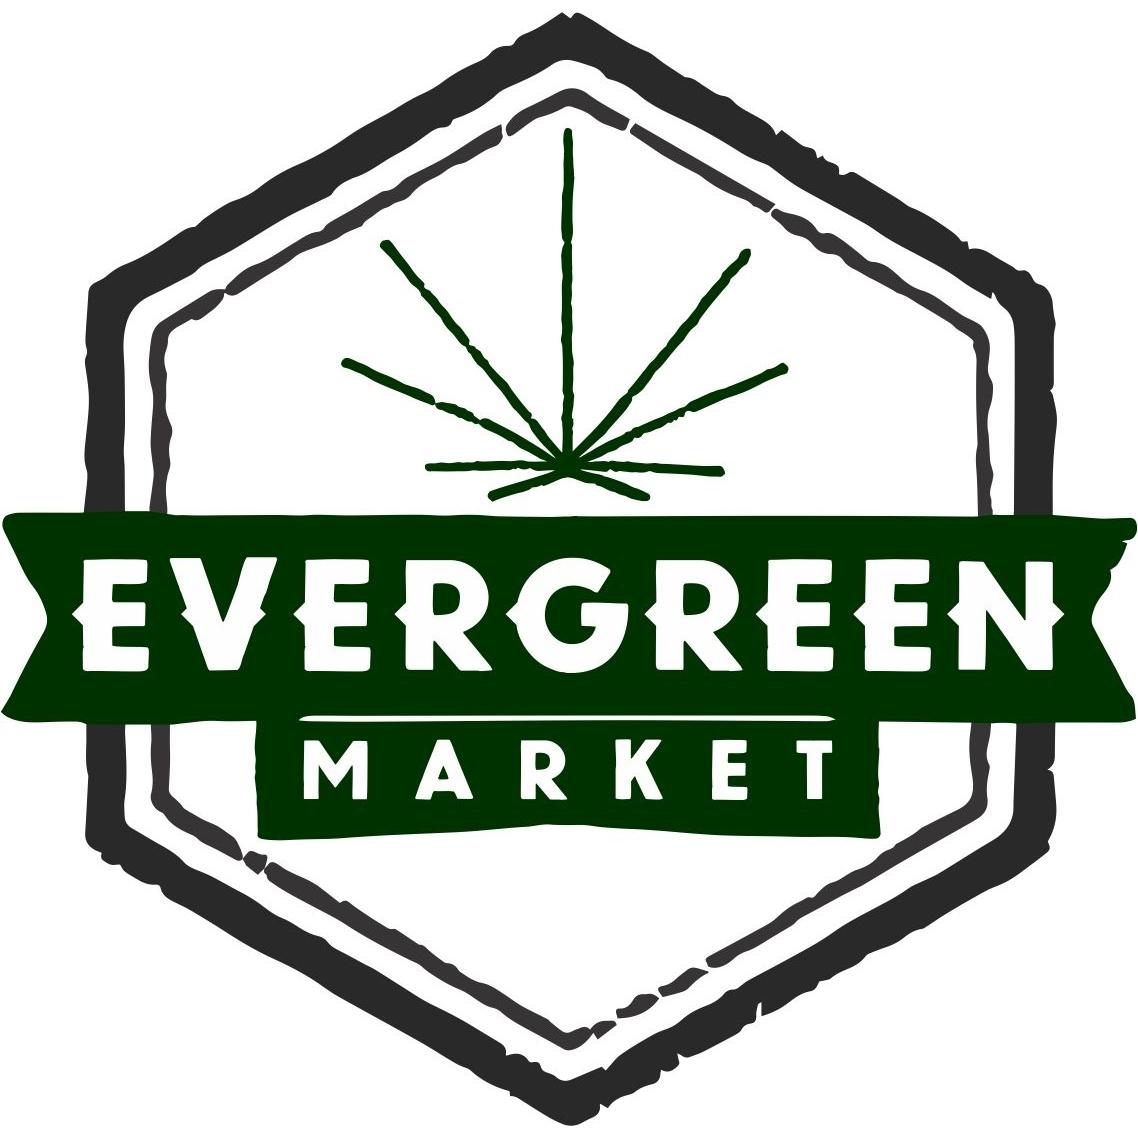 The Evergreen Market